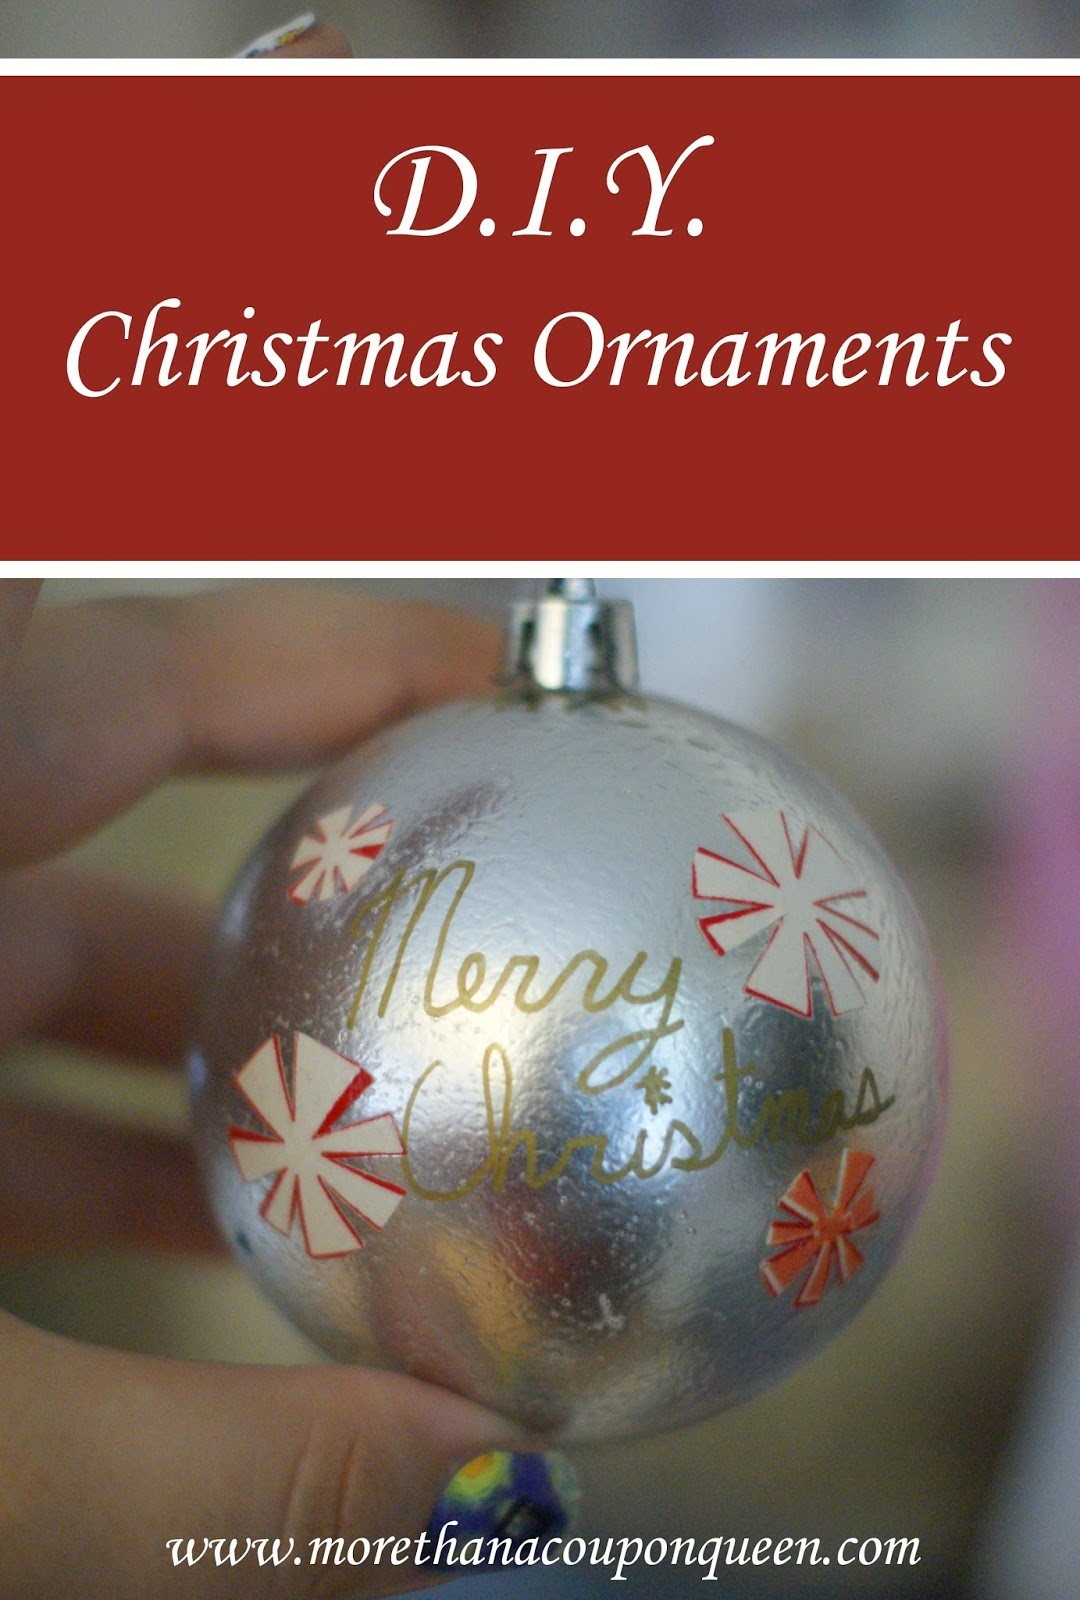 D.I.Y. Christmas Ornaments